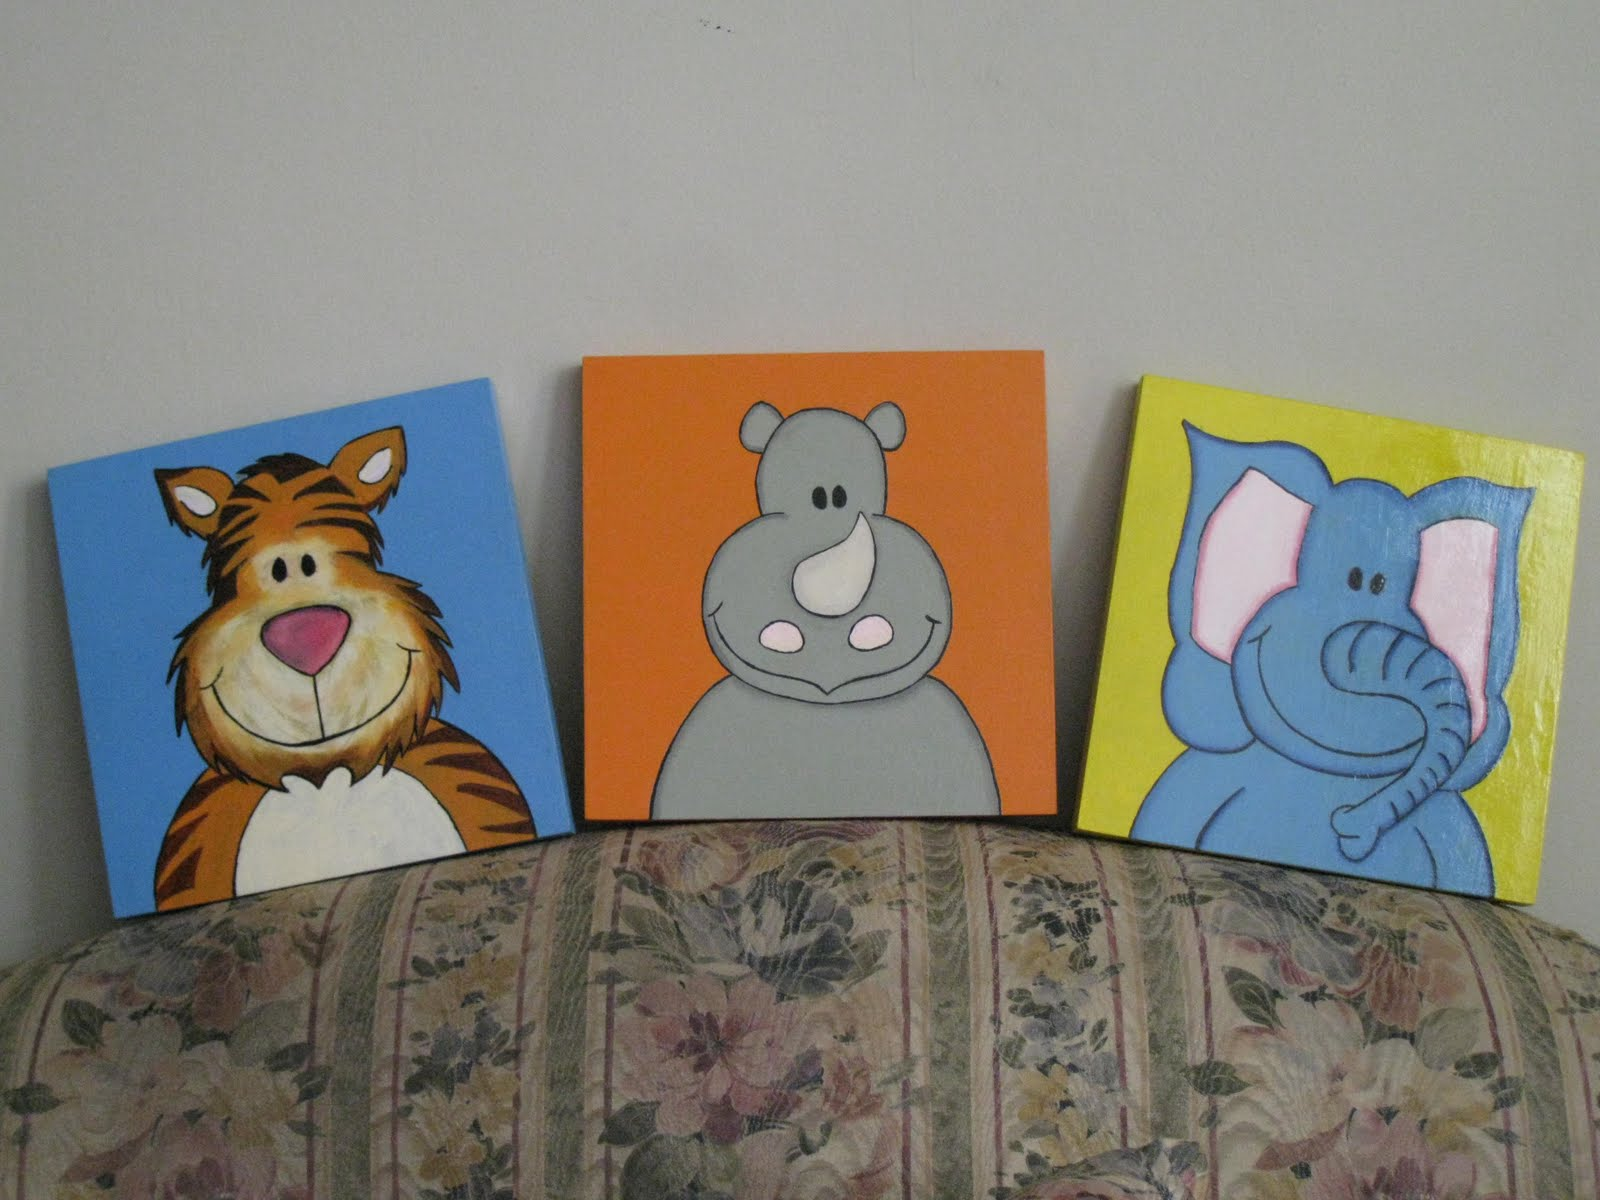 "ARTEMANIA PERU"" - Galeria de cuadros: Cuadros infantiles ""Animales ..."